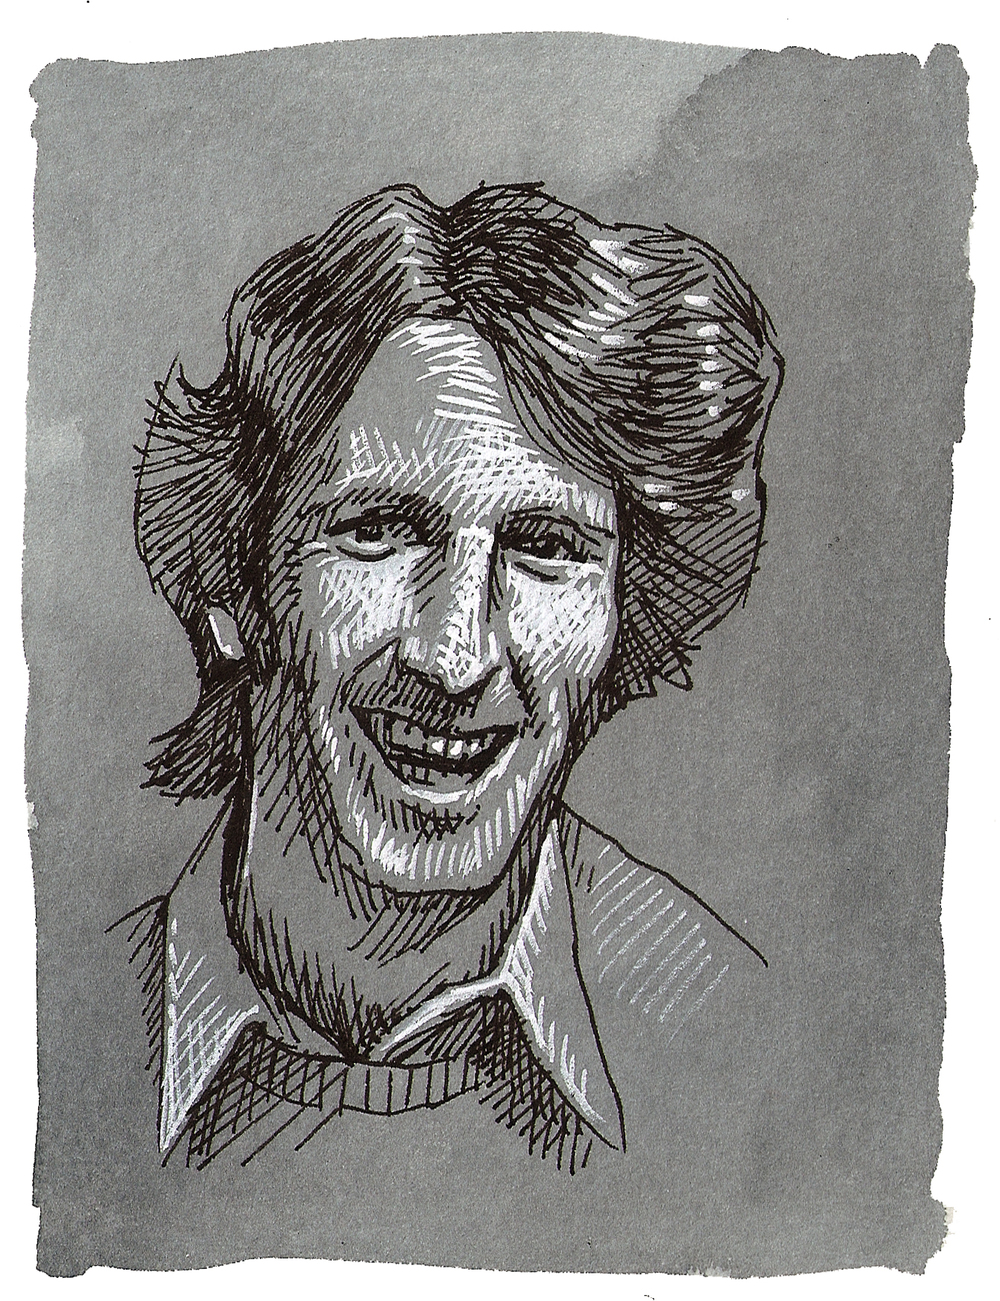 '1970's Man'